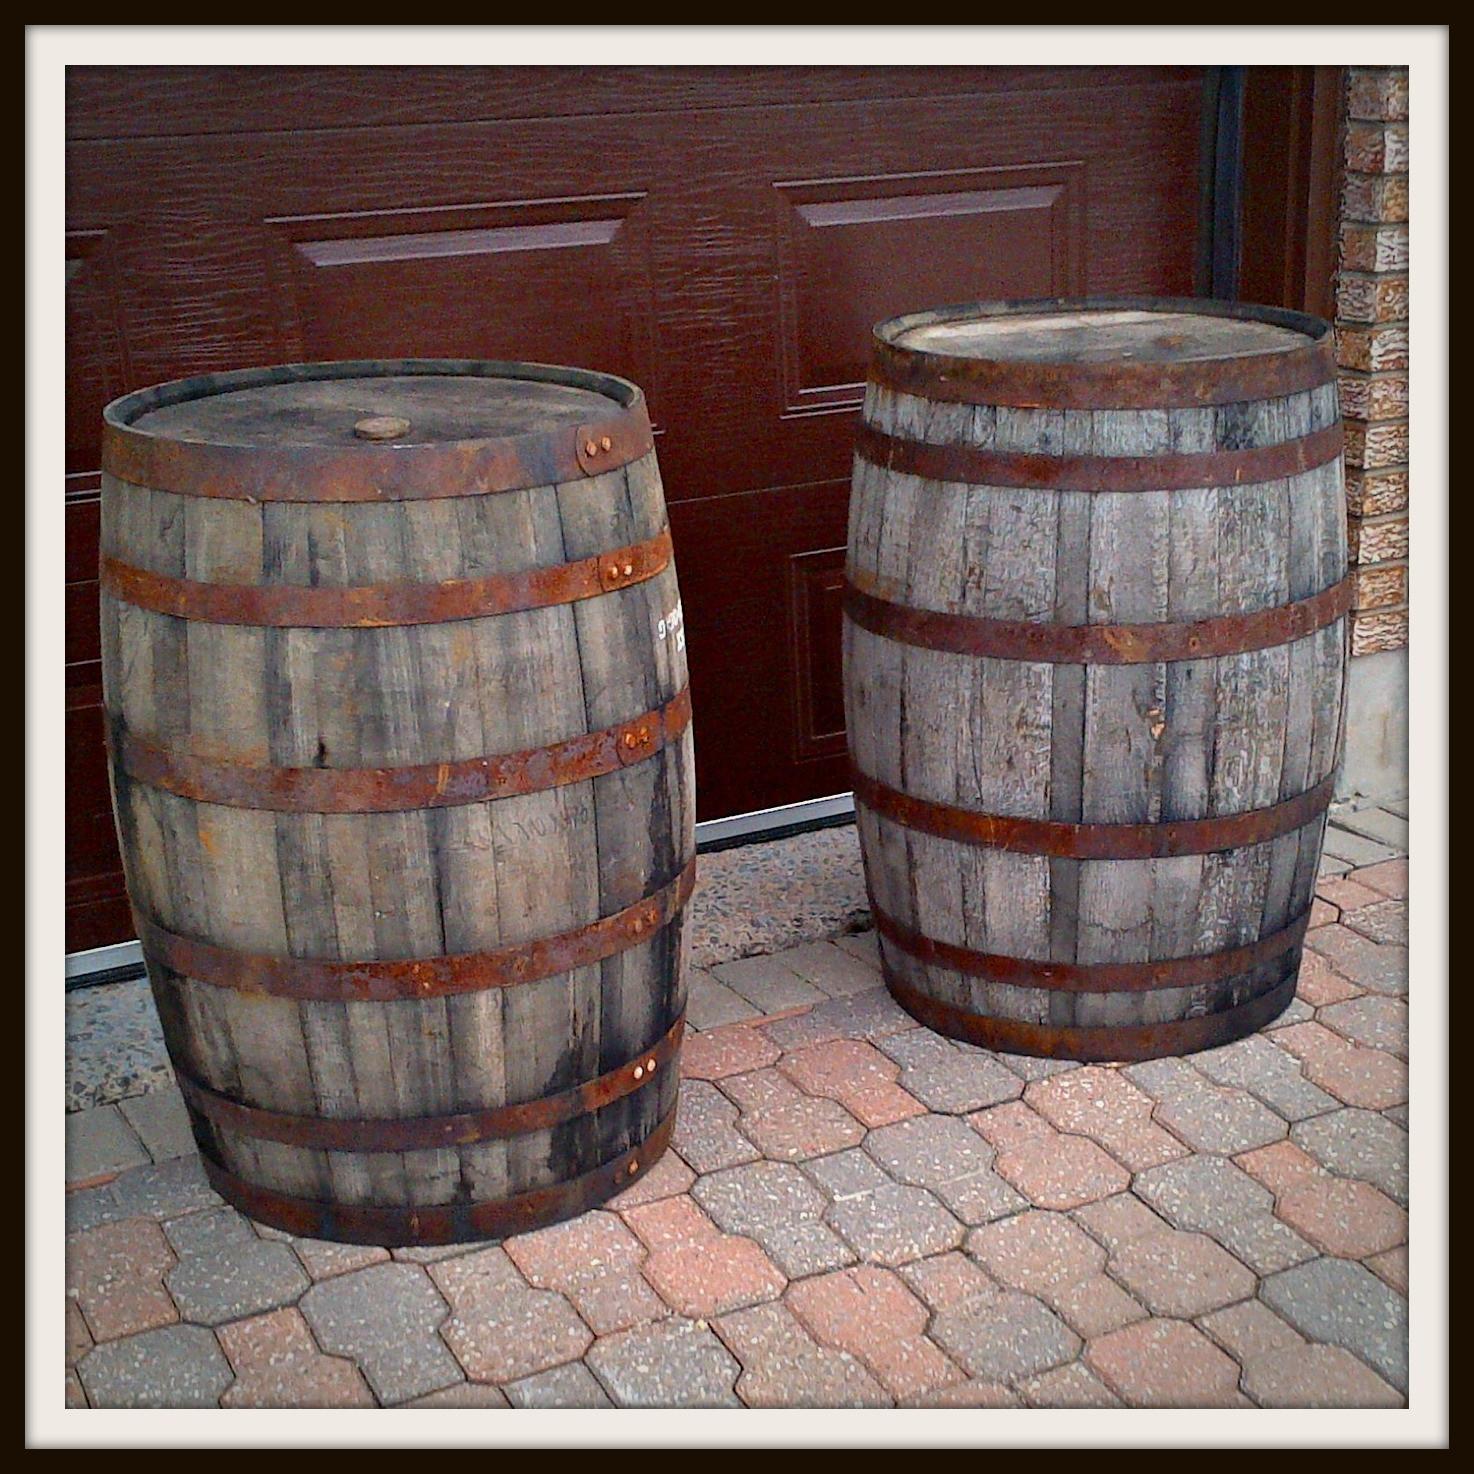 DIY Wooden Barrel  Whiskey into Water Rain Barrel DIY